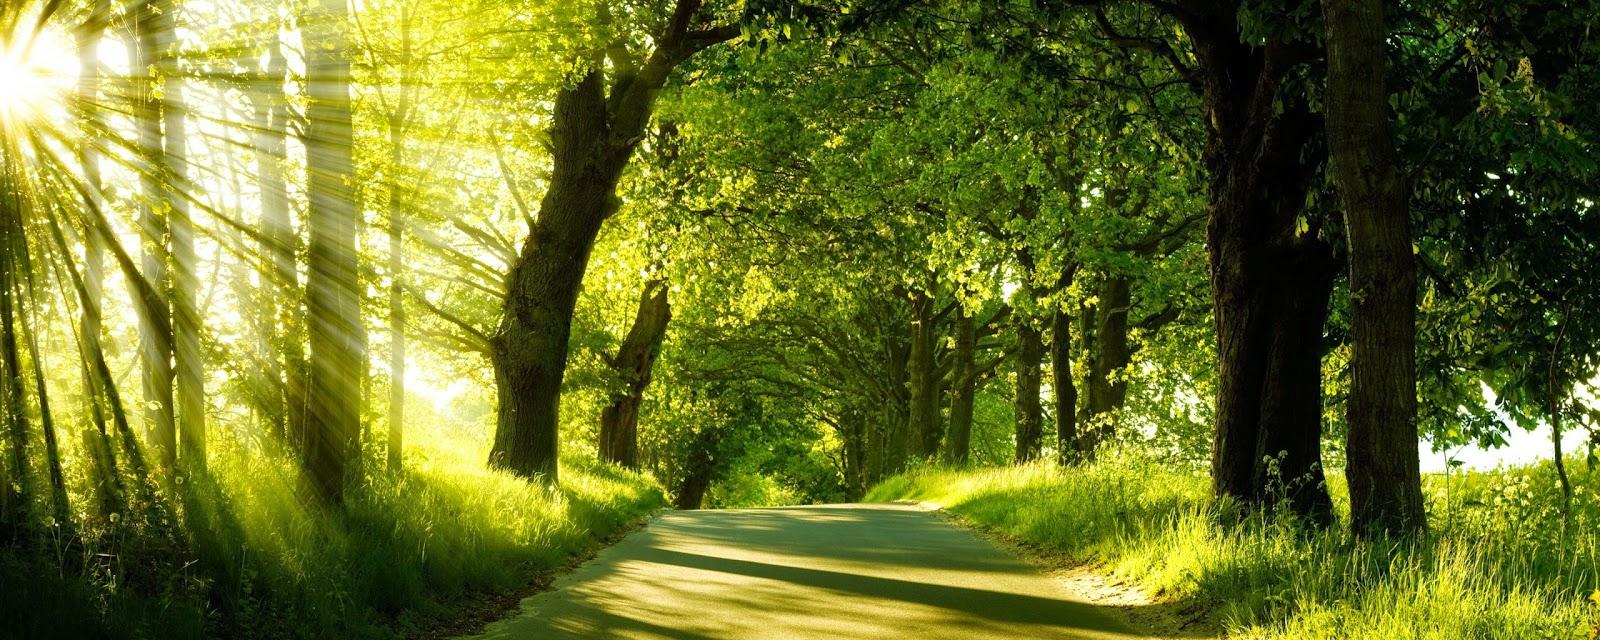 Best Nature Photos For Desktop